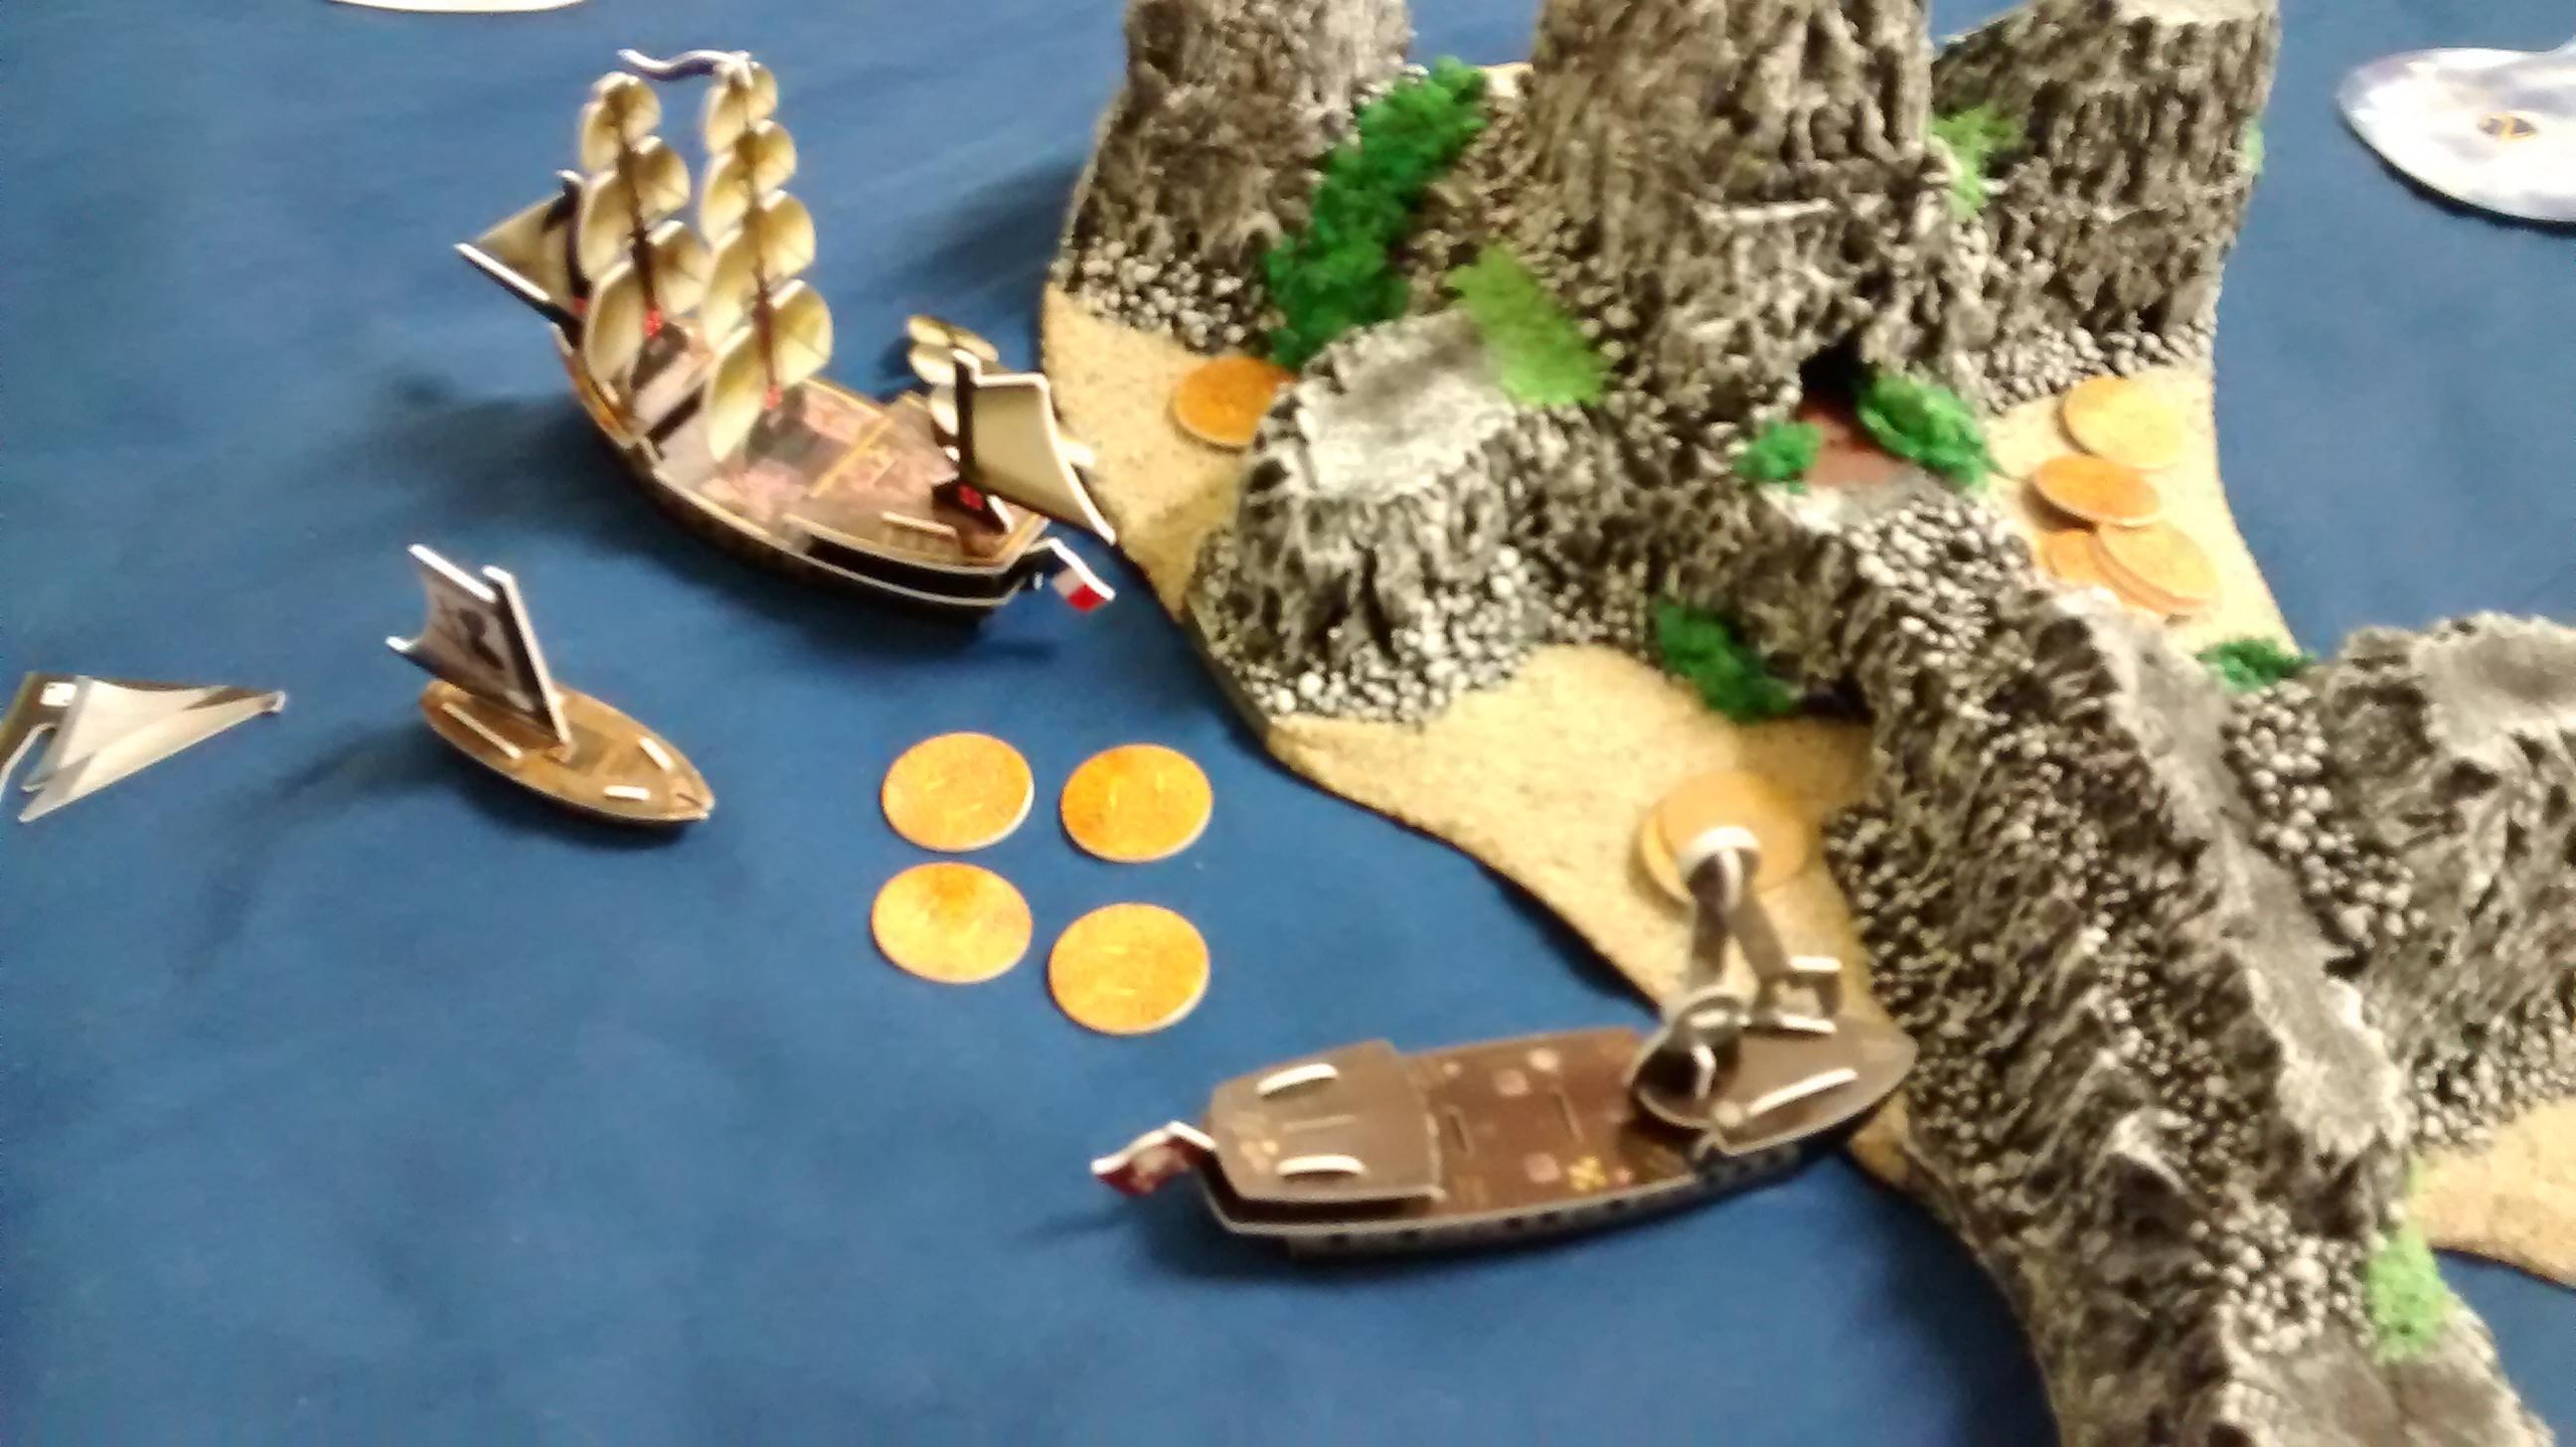 Tenfold home island raid!